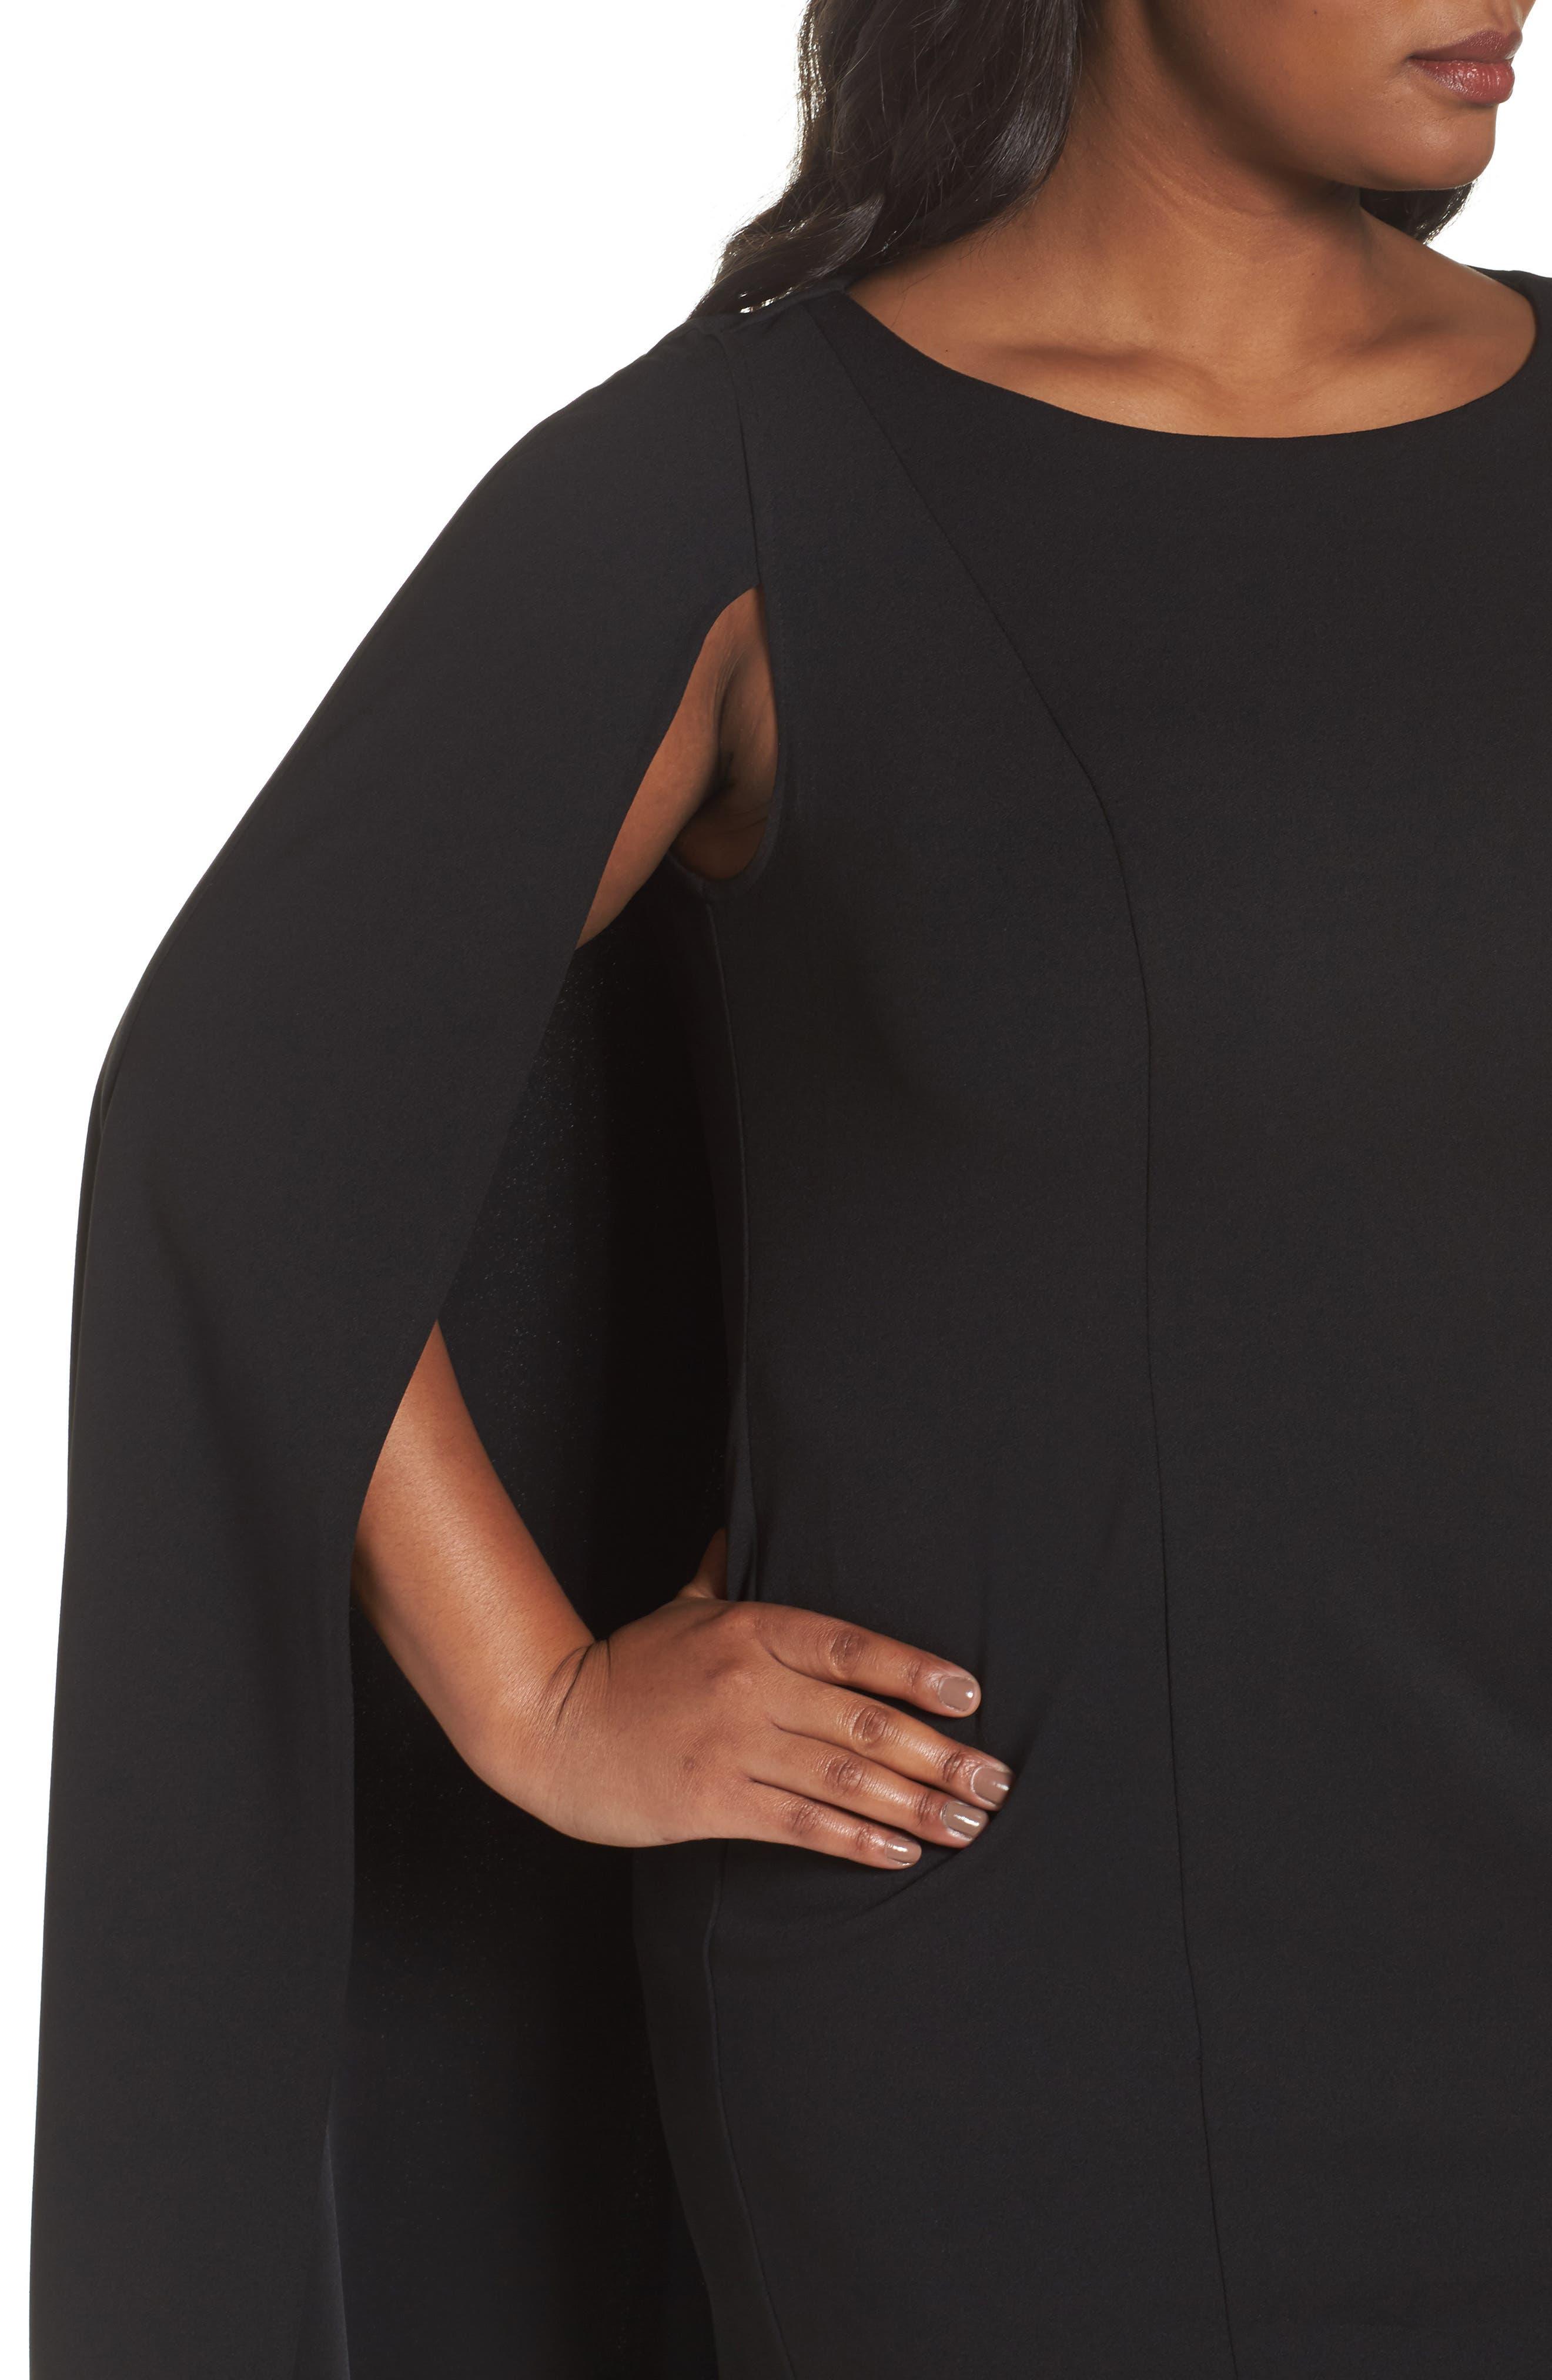 Cape Sheath Dress,                             Alternate thumbnail 5, color,                             001